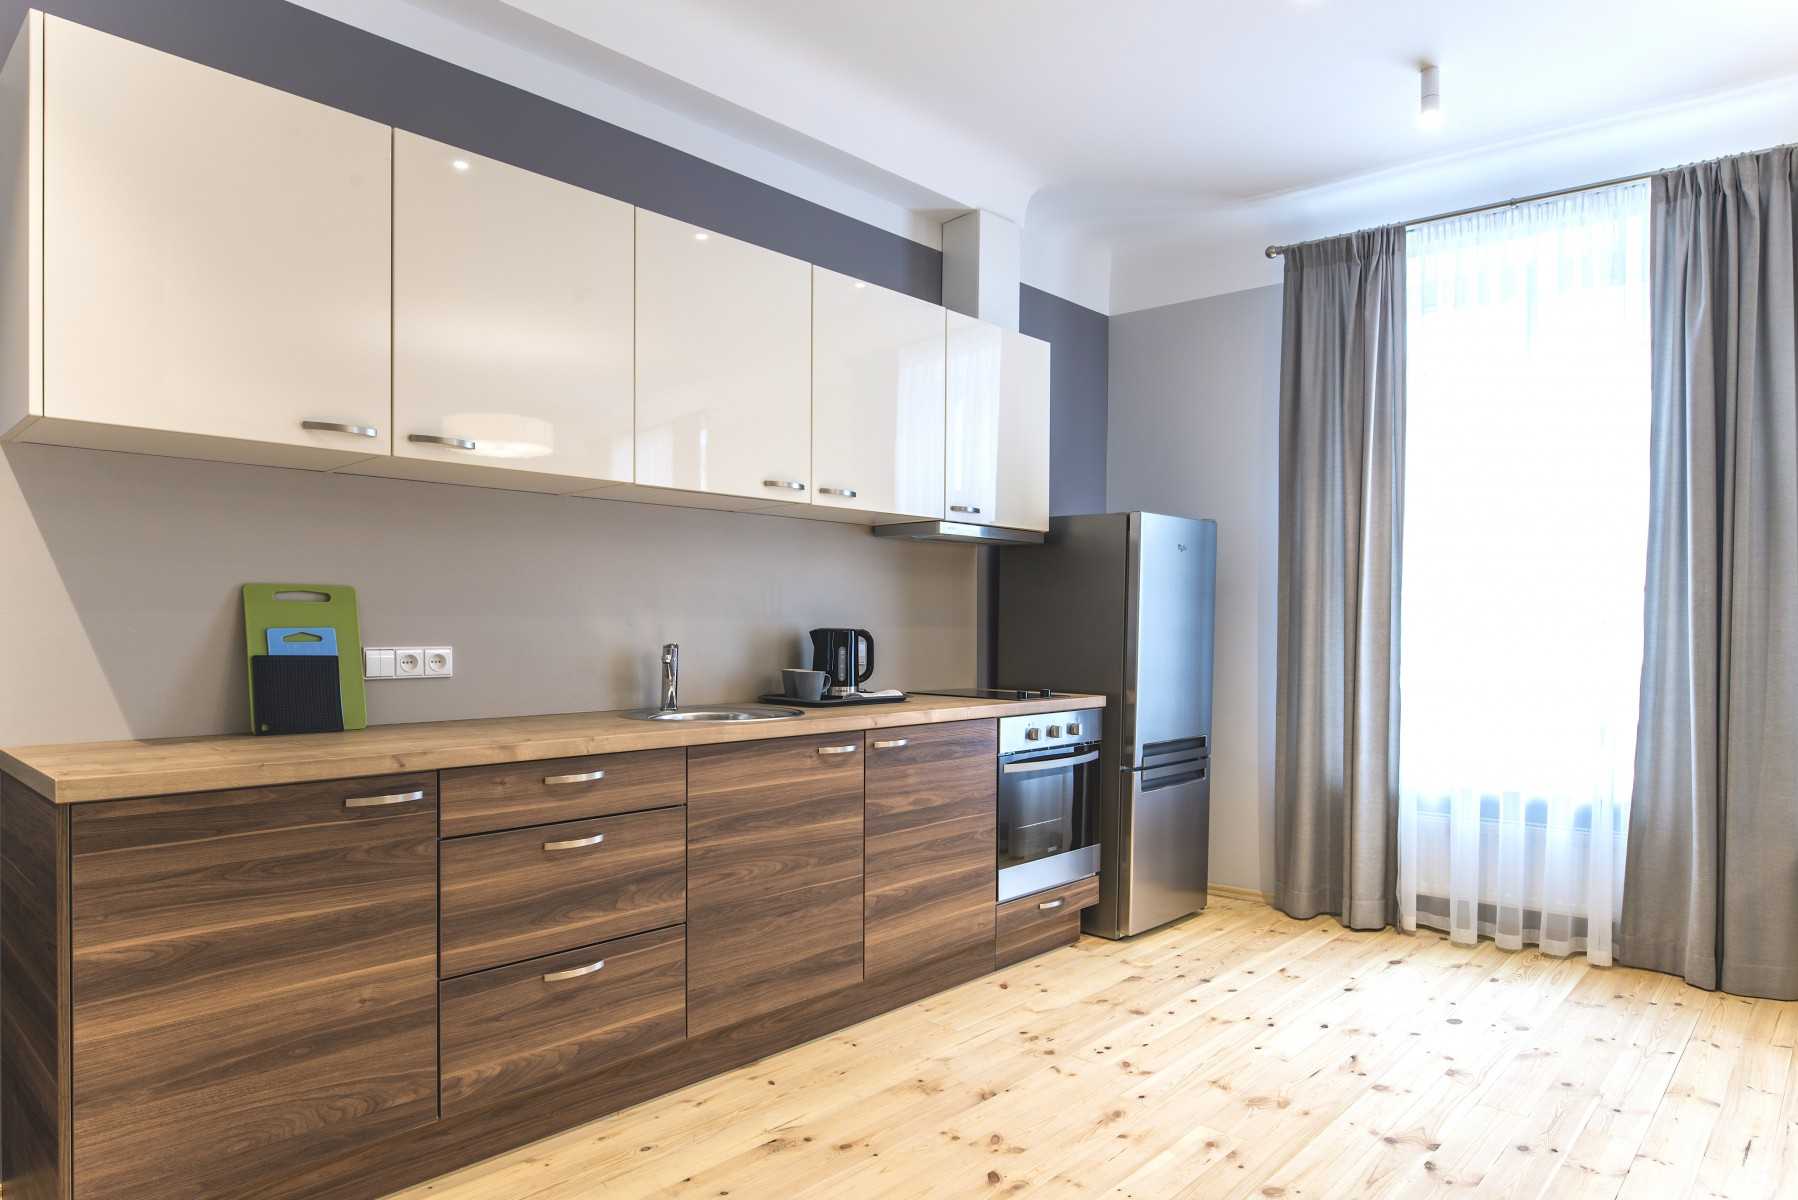 Virtuves mēbeles īres projektiem